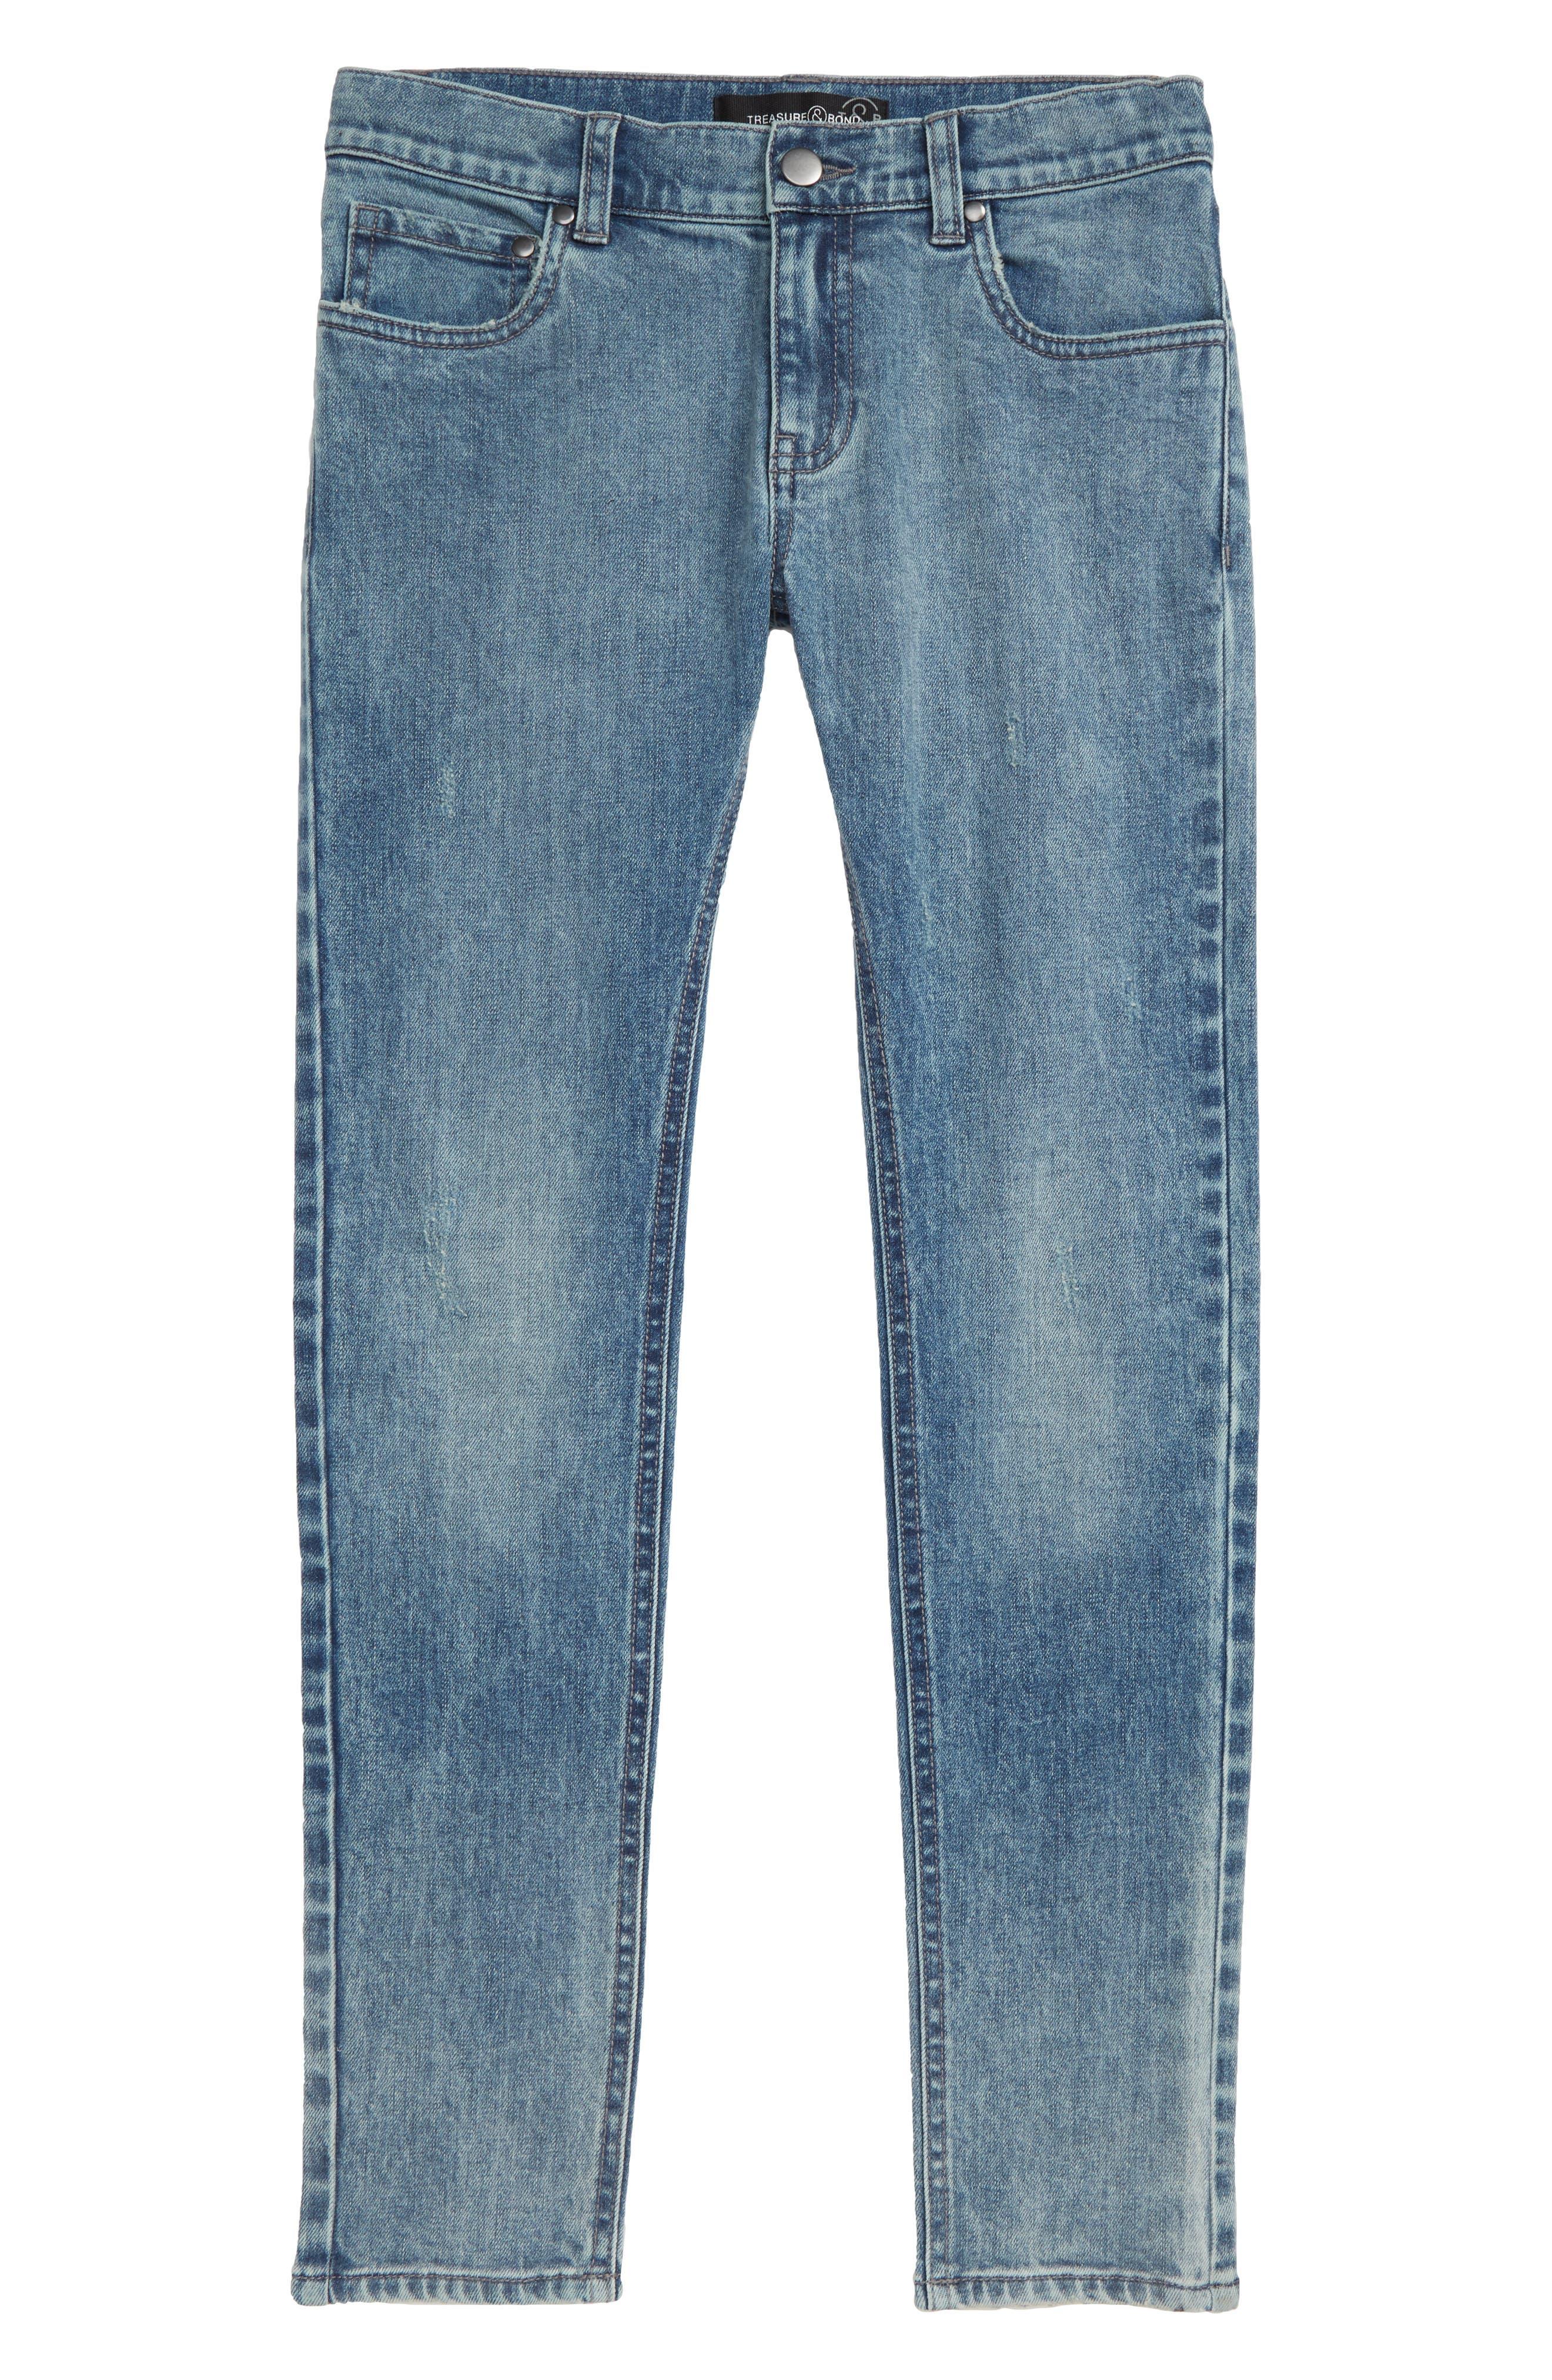 Treaure & Bond Light Wash Jeans,                             Main thumbnail 1, color,                             ACID FADE WASH